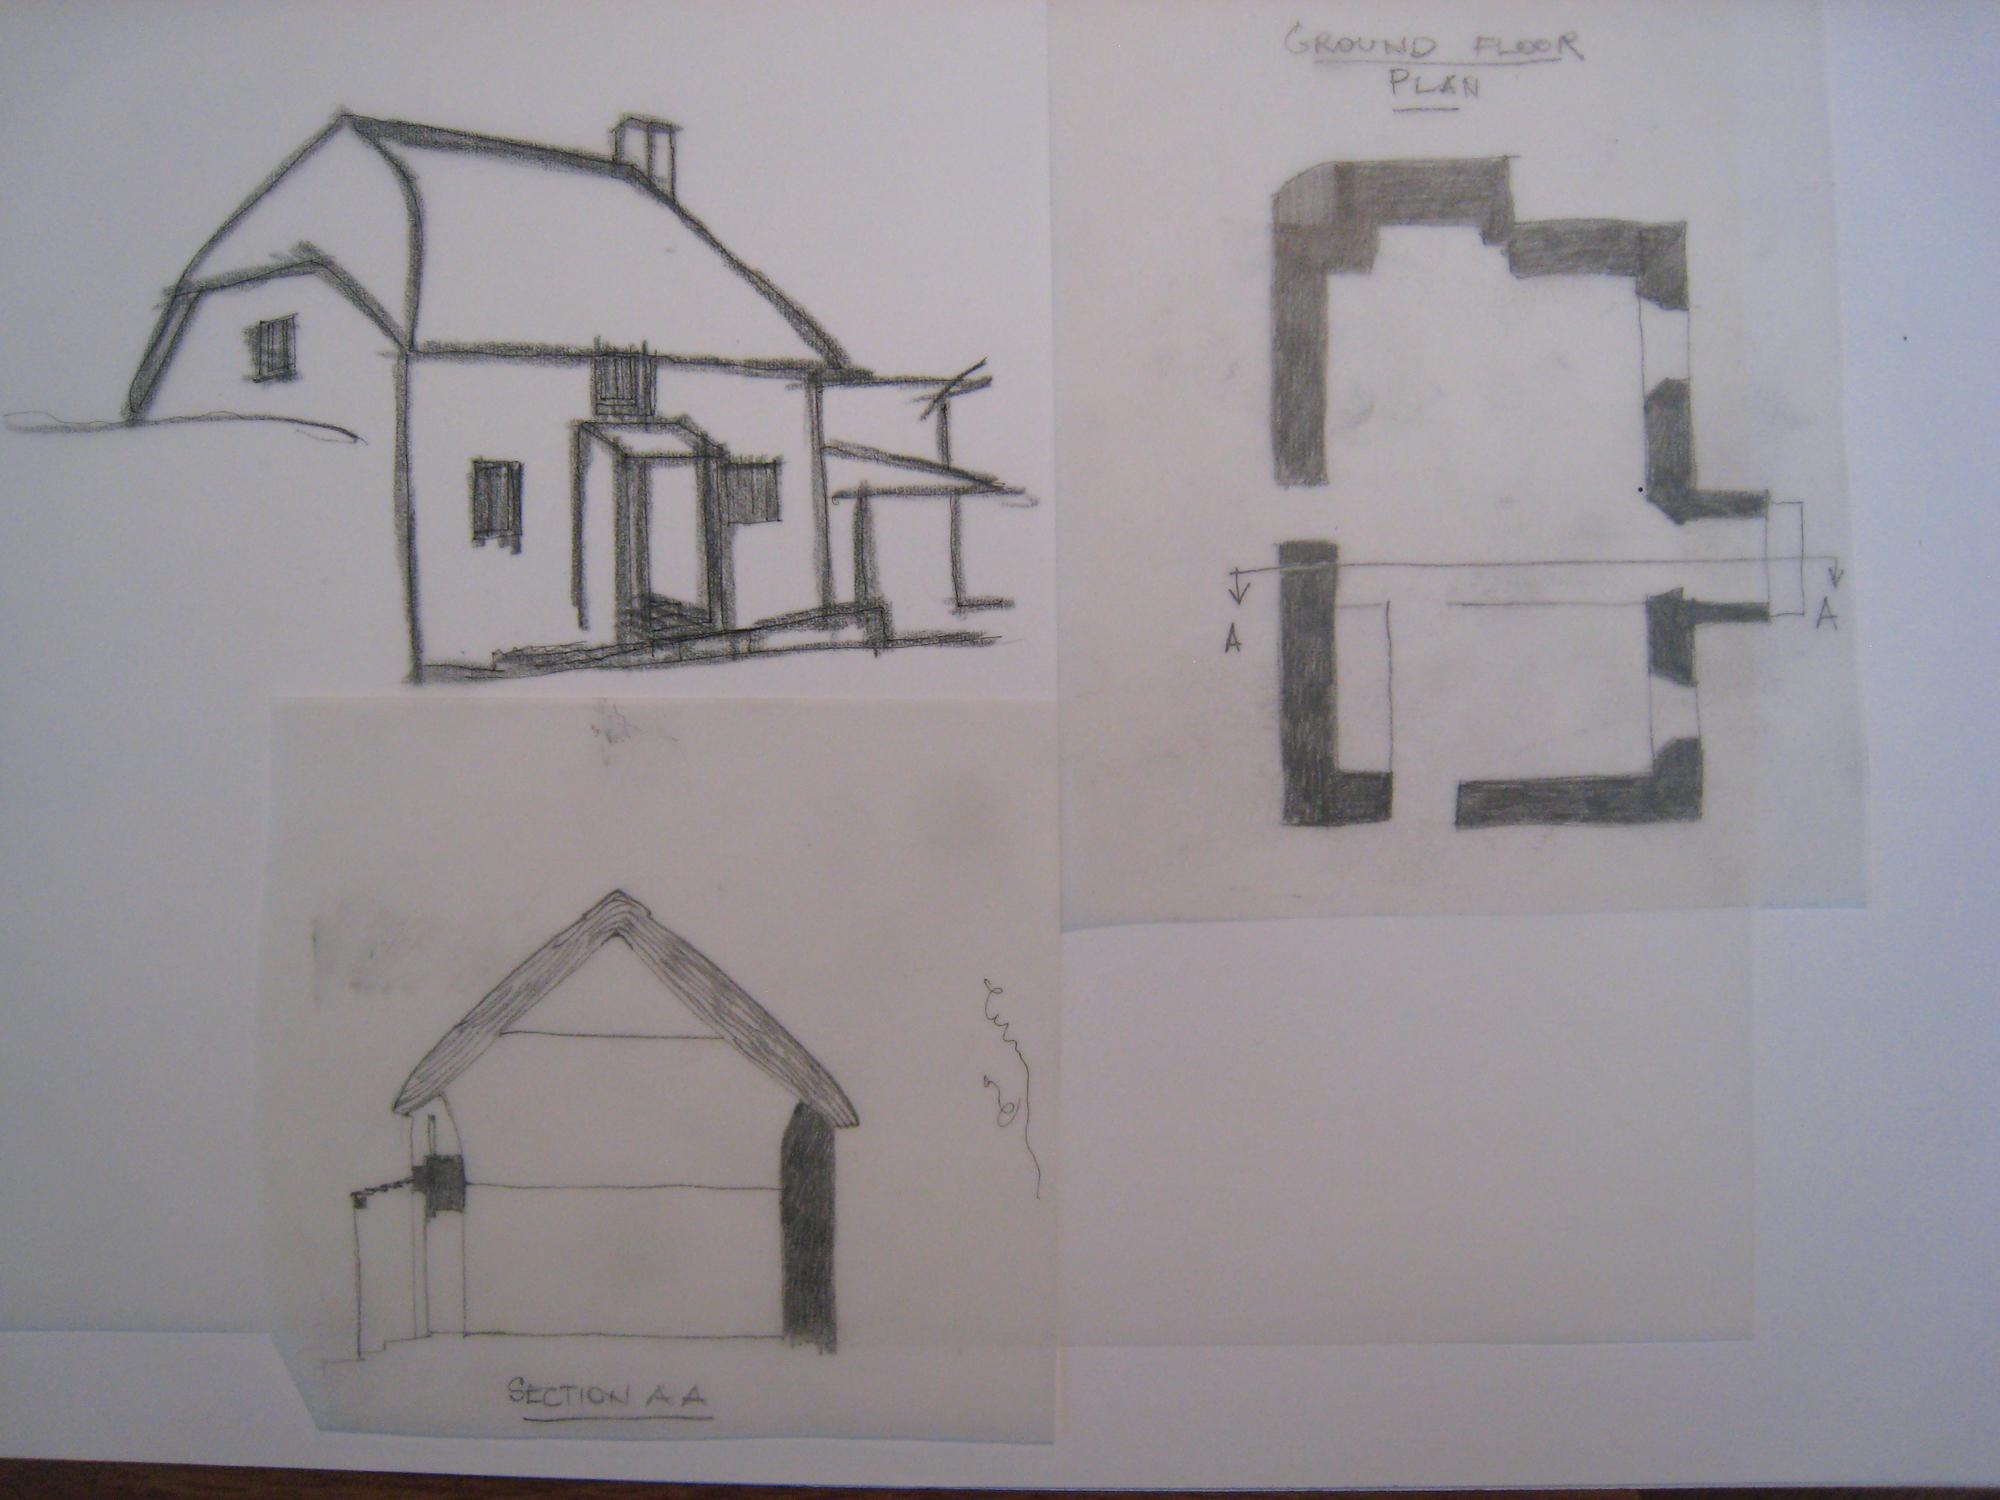 simplified drawing and plan of Bidlake Cottage, Germansweek